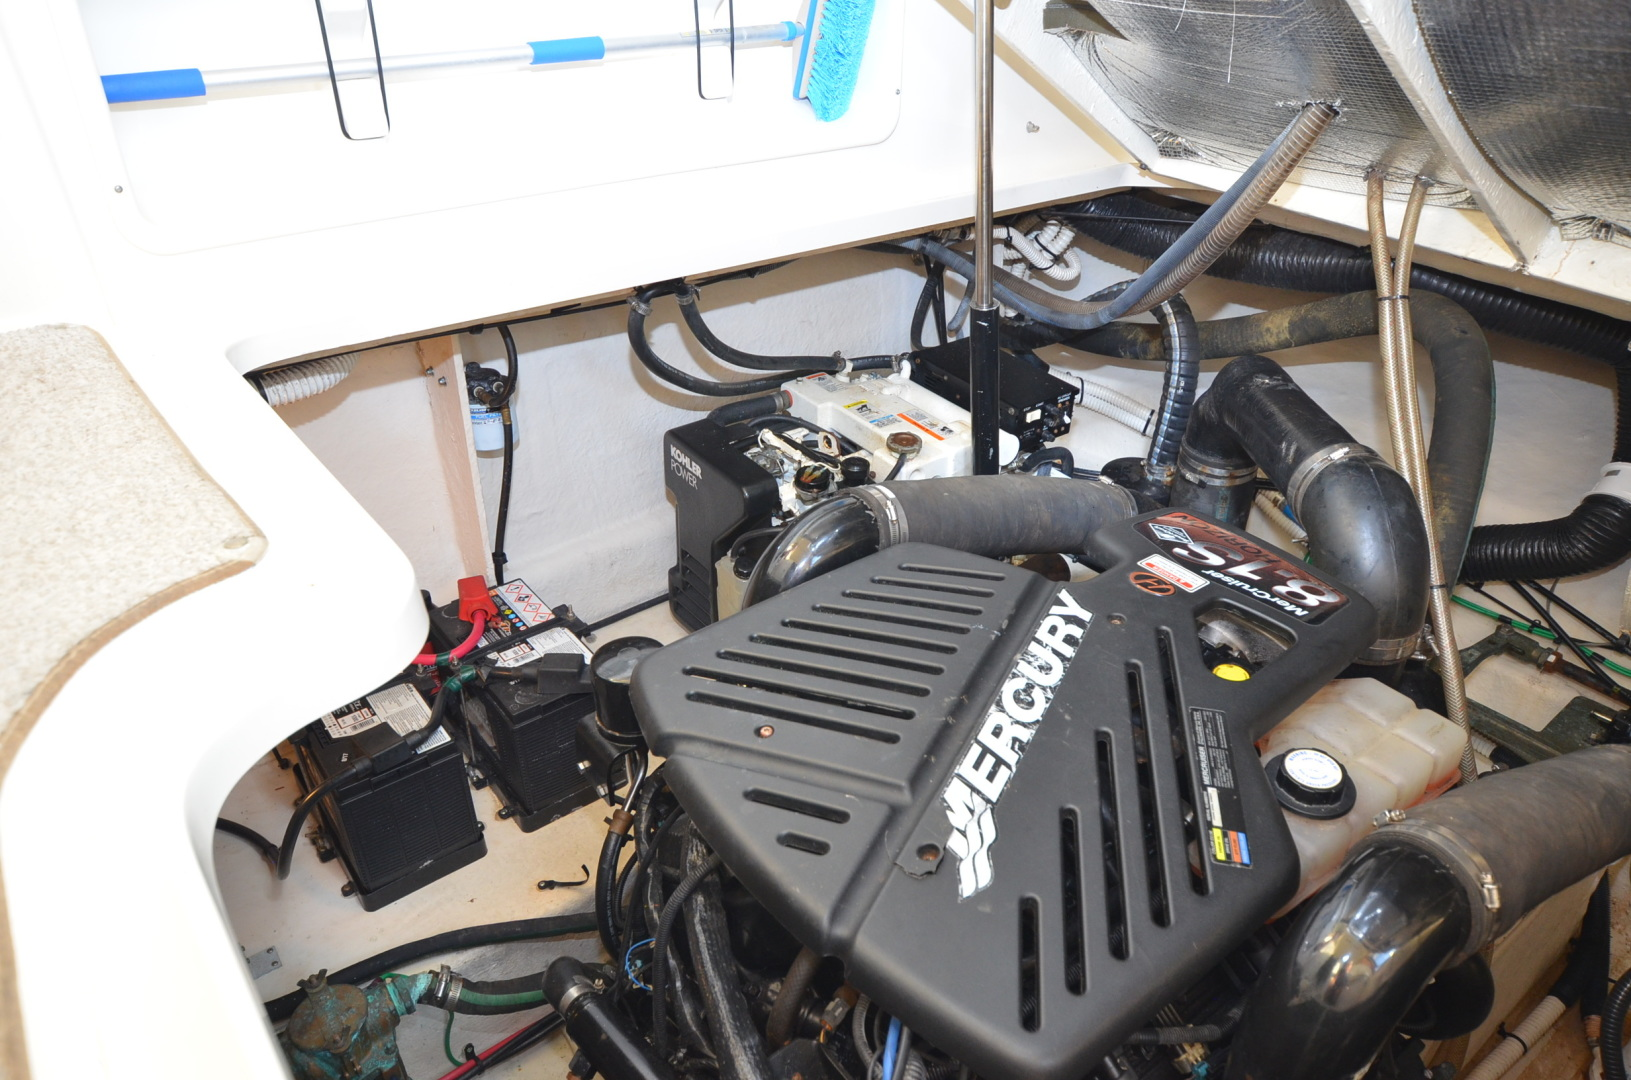 Sea Ray-340 Sundancer 2005-Better Place Palm Harbor-Florida-United States-1562838 | Thumbnail